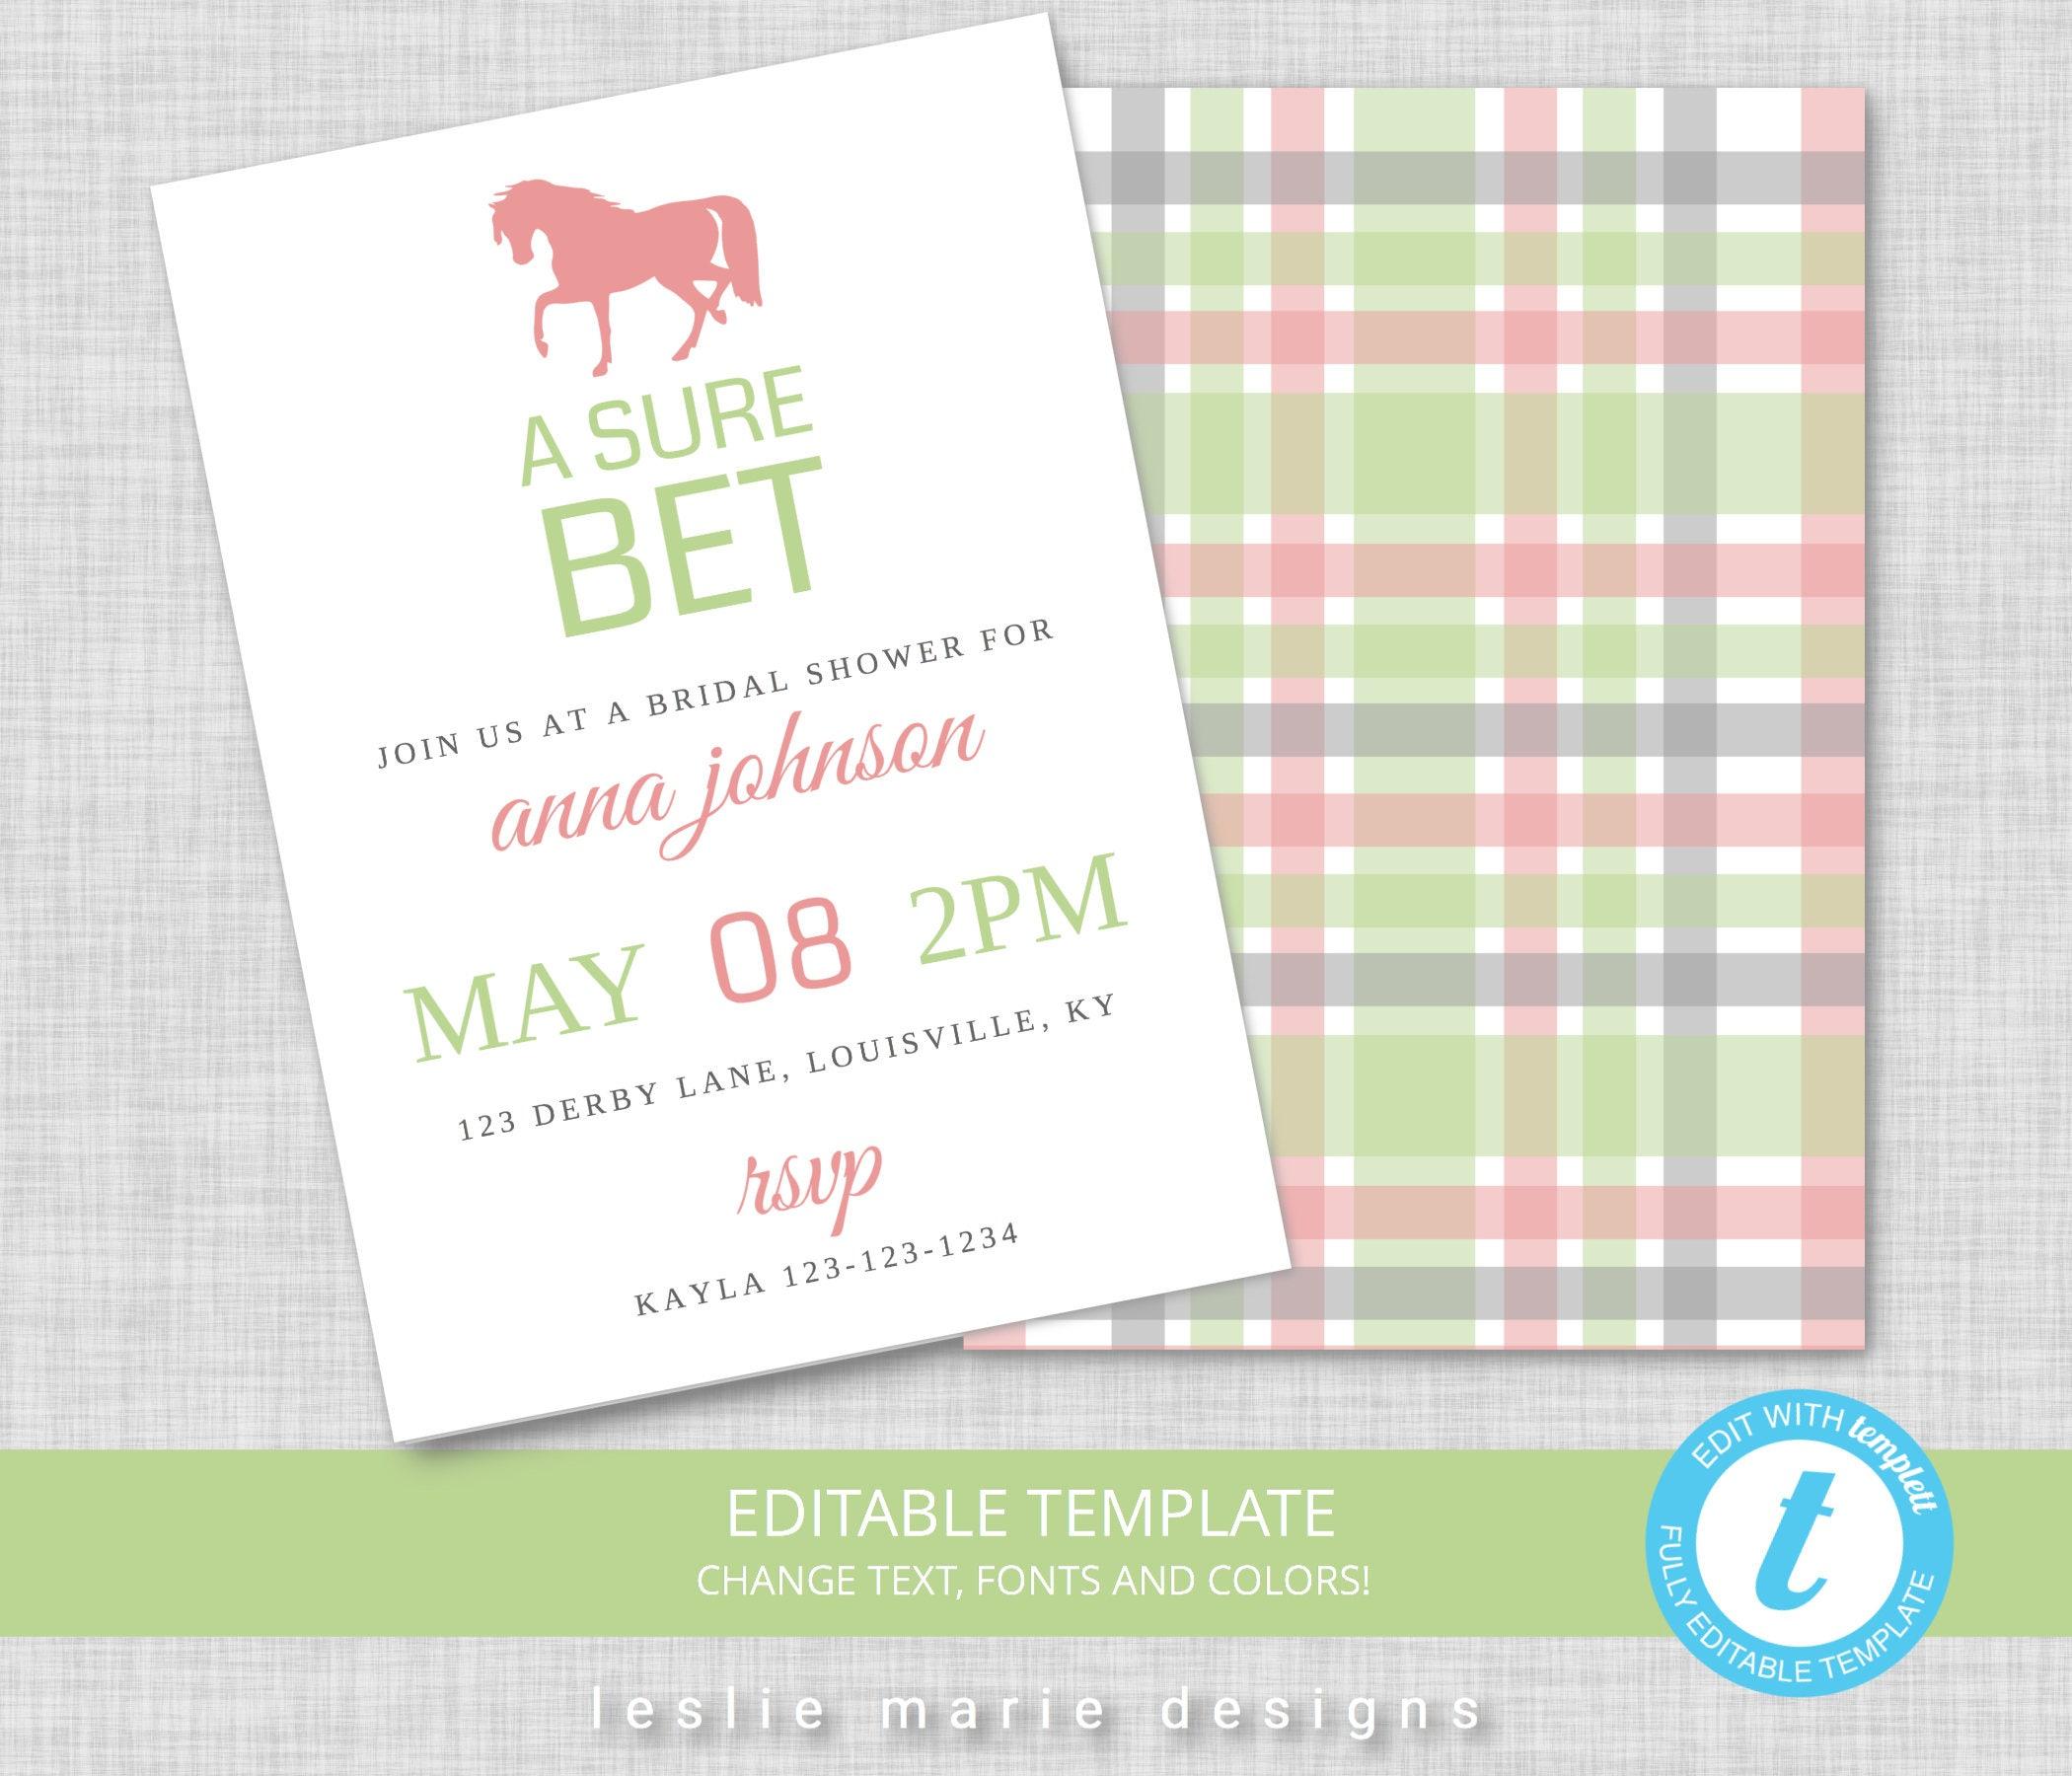 Kentucky Derby Party Invitation Kentucky Derby Bridal Shower | Etsy